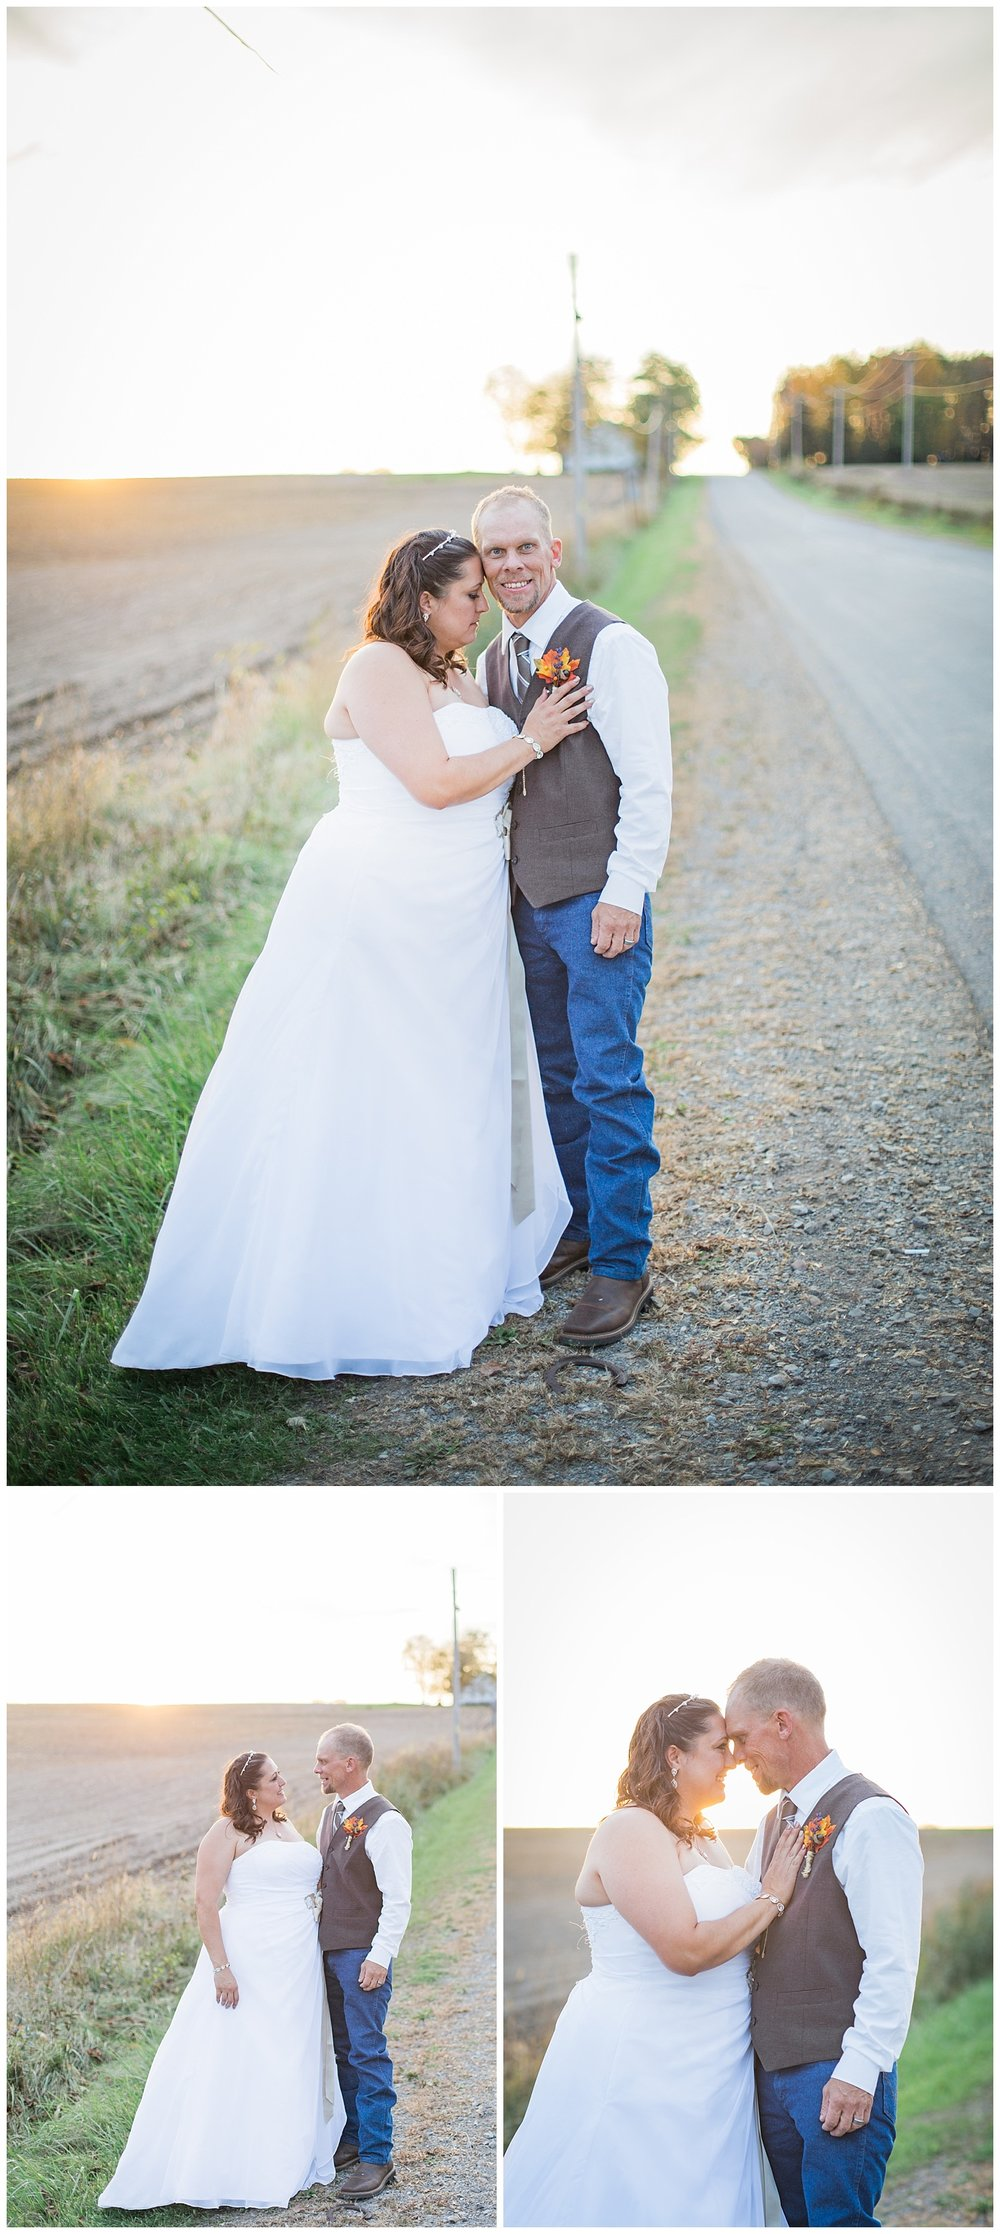 The Hall Wedding - York NY - Lass and Beau-1148_Buffalo wedding photography.jpg